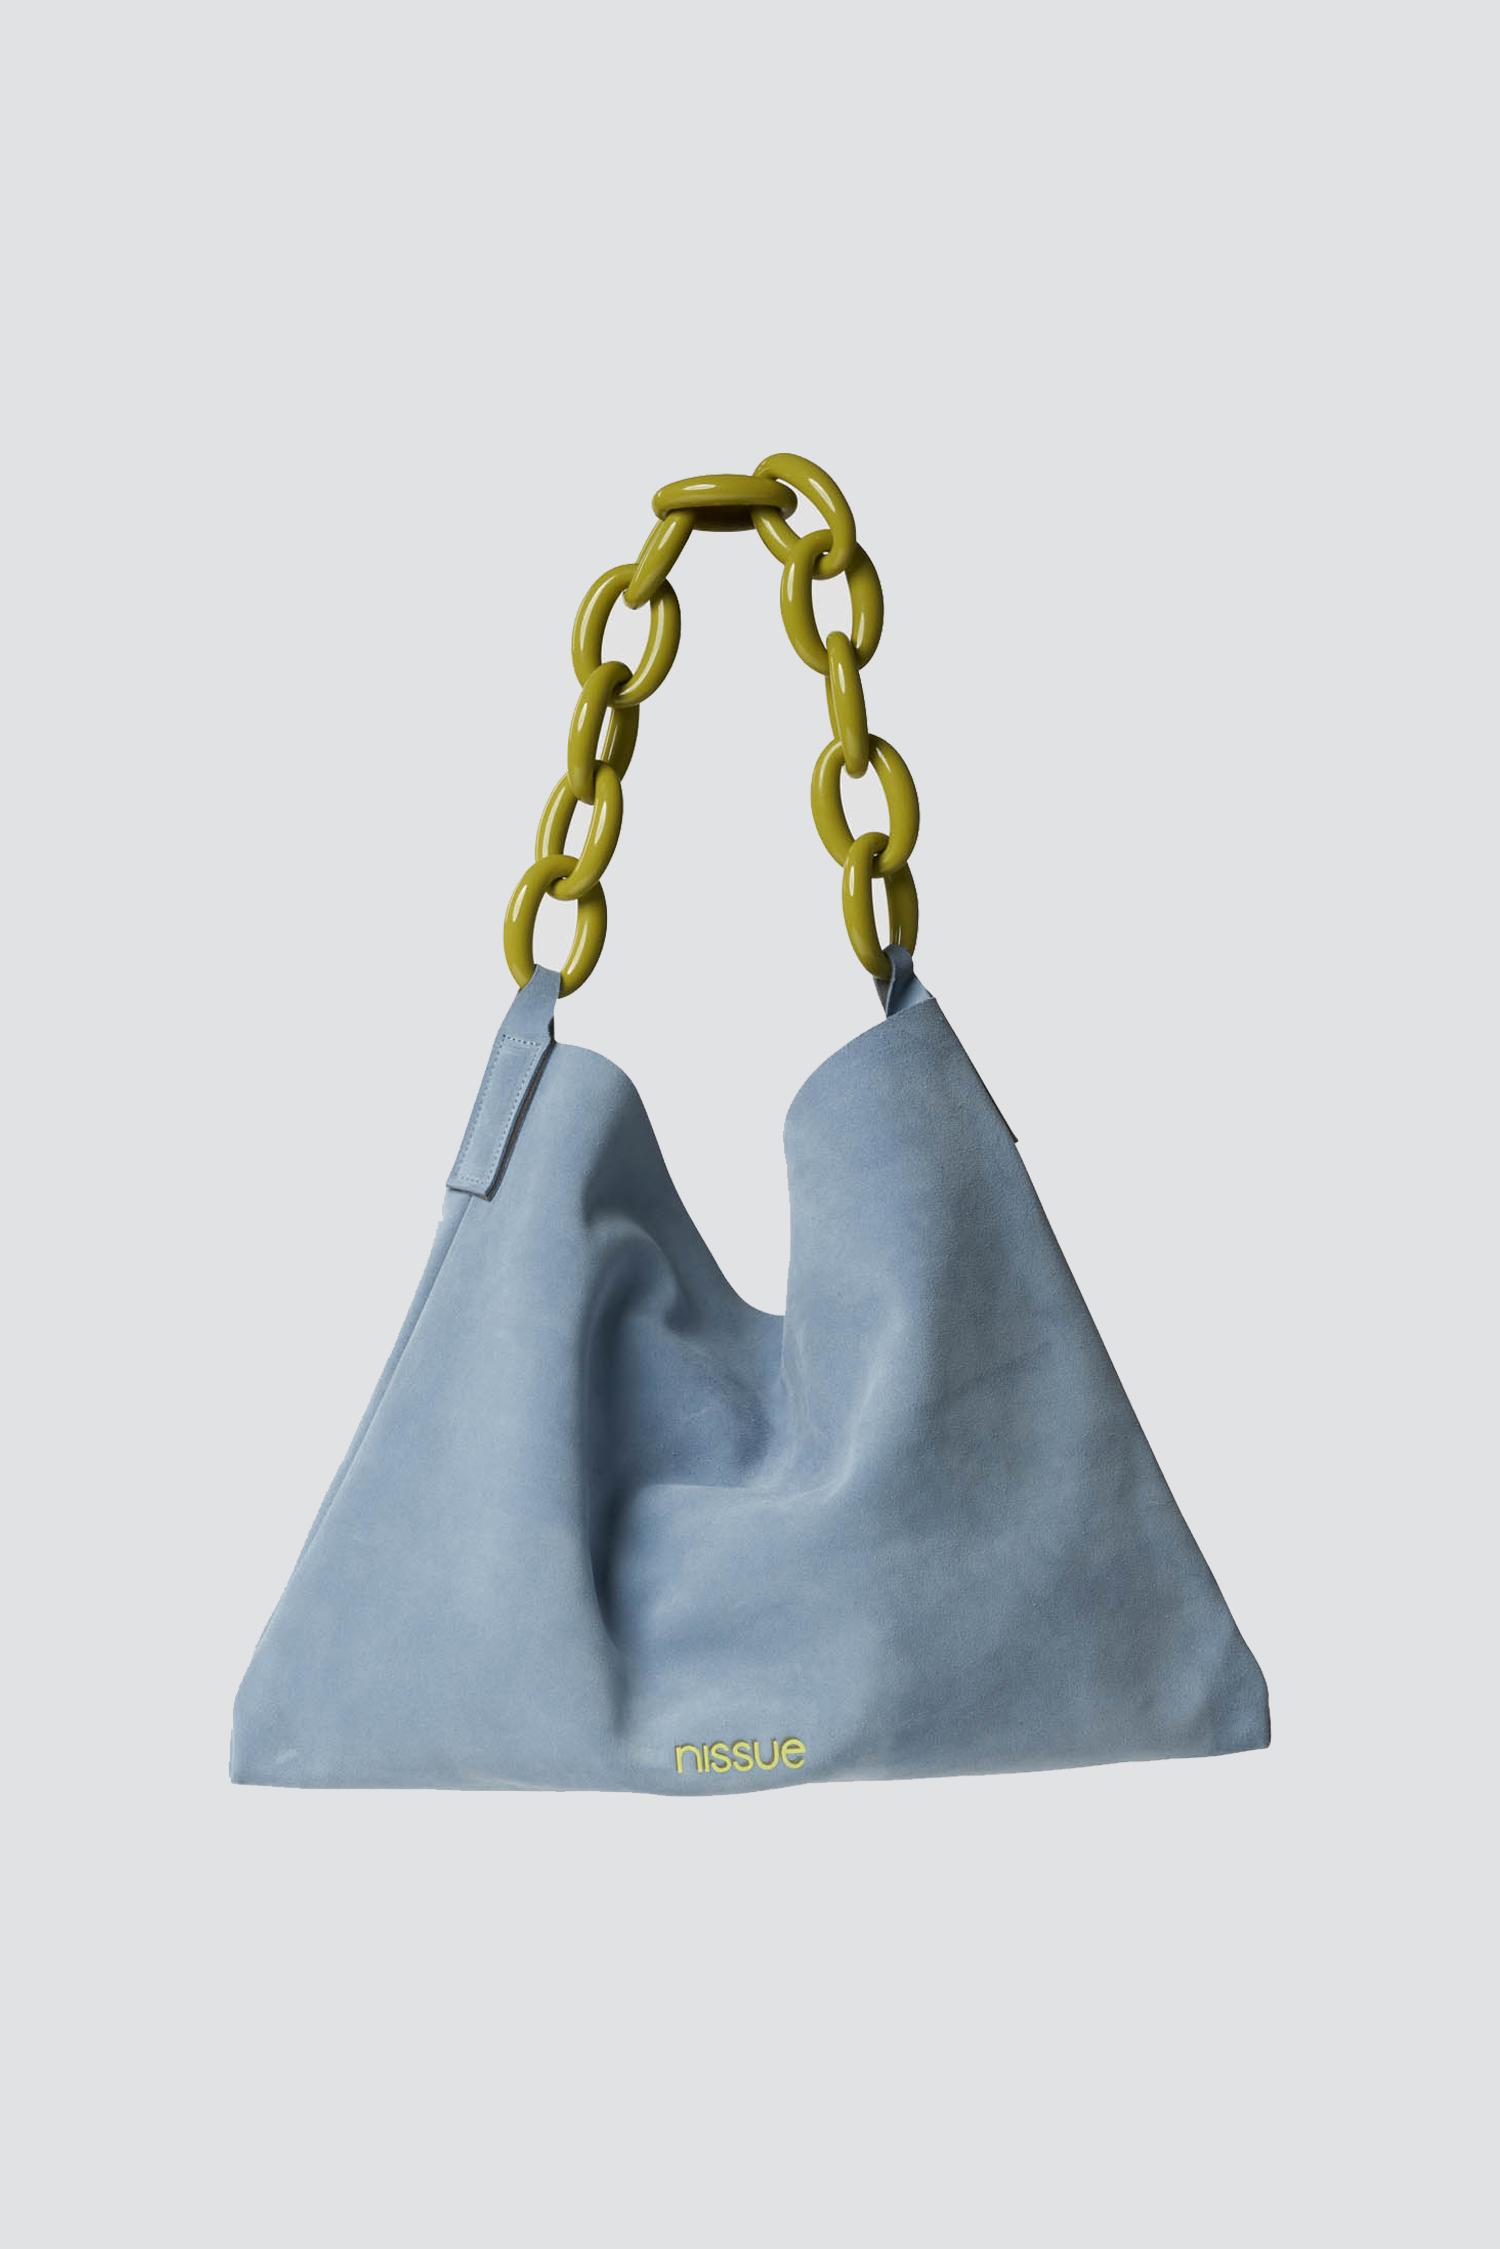 Nissue Hobo Chain Sky Blue